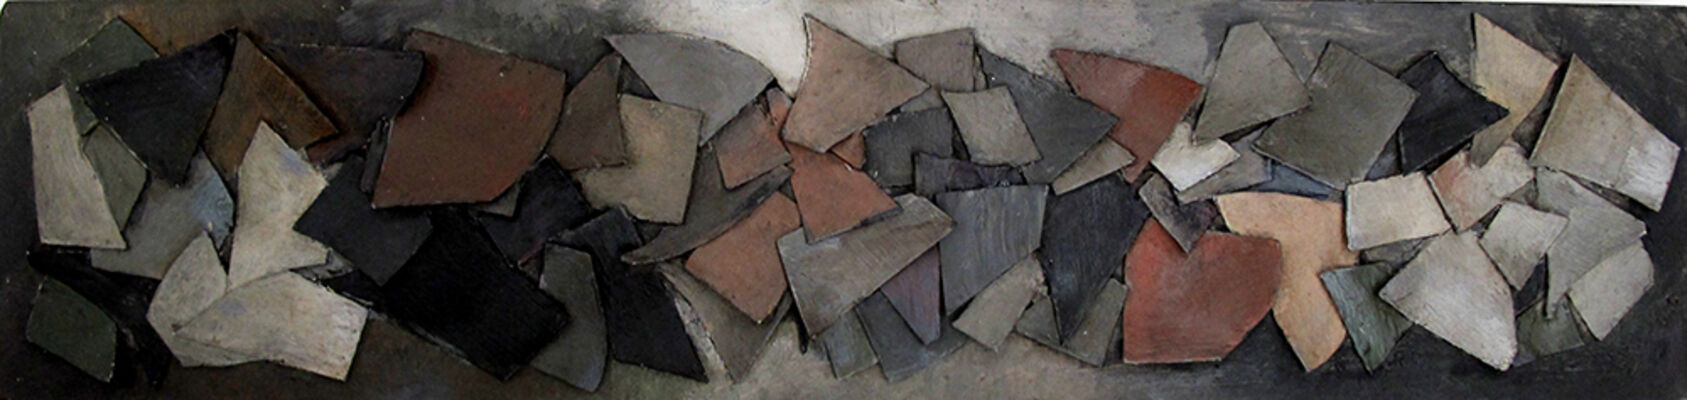 Ofício da Cor: pinturas e objetos de Bárbara Spanoudis, installation view